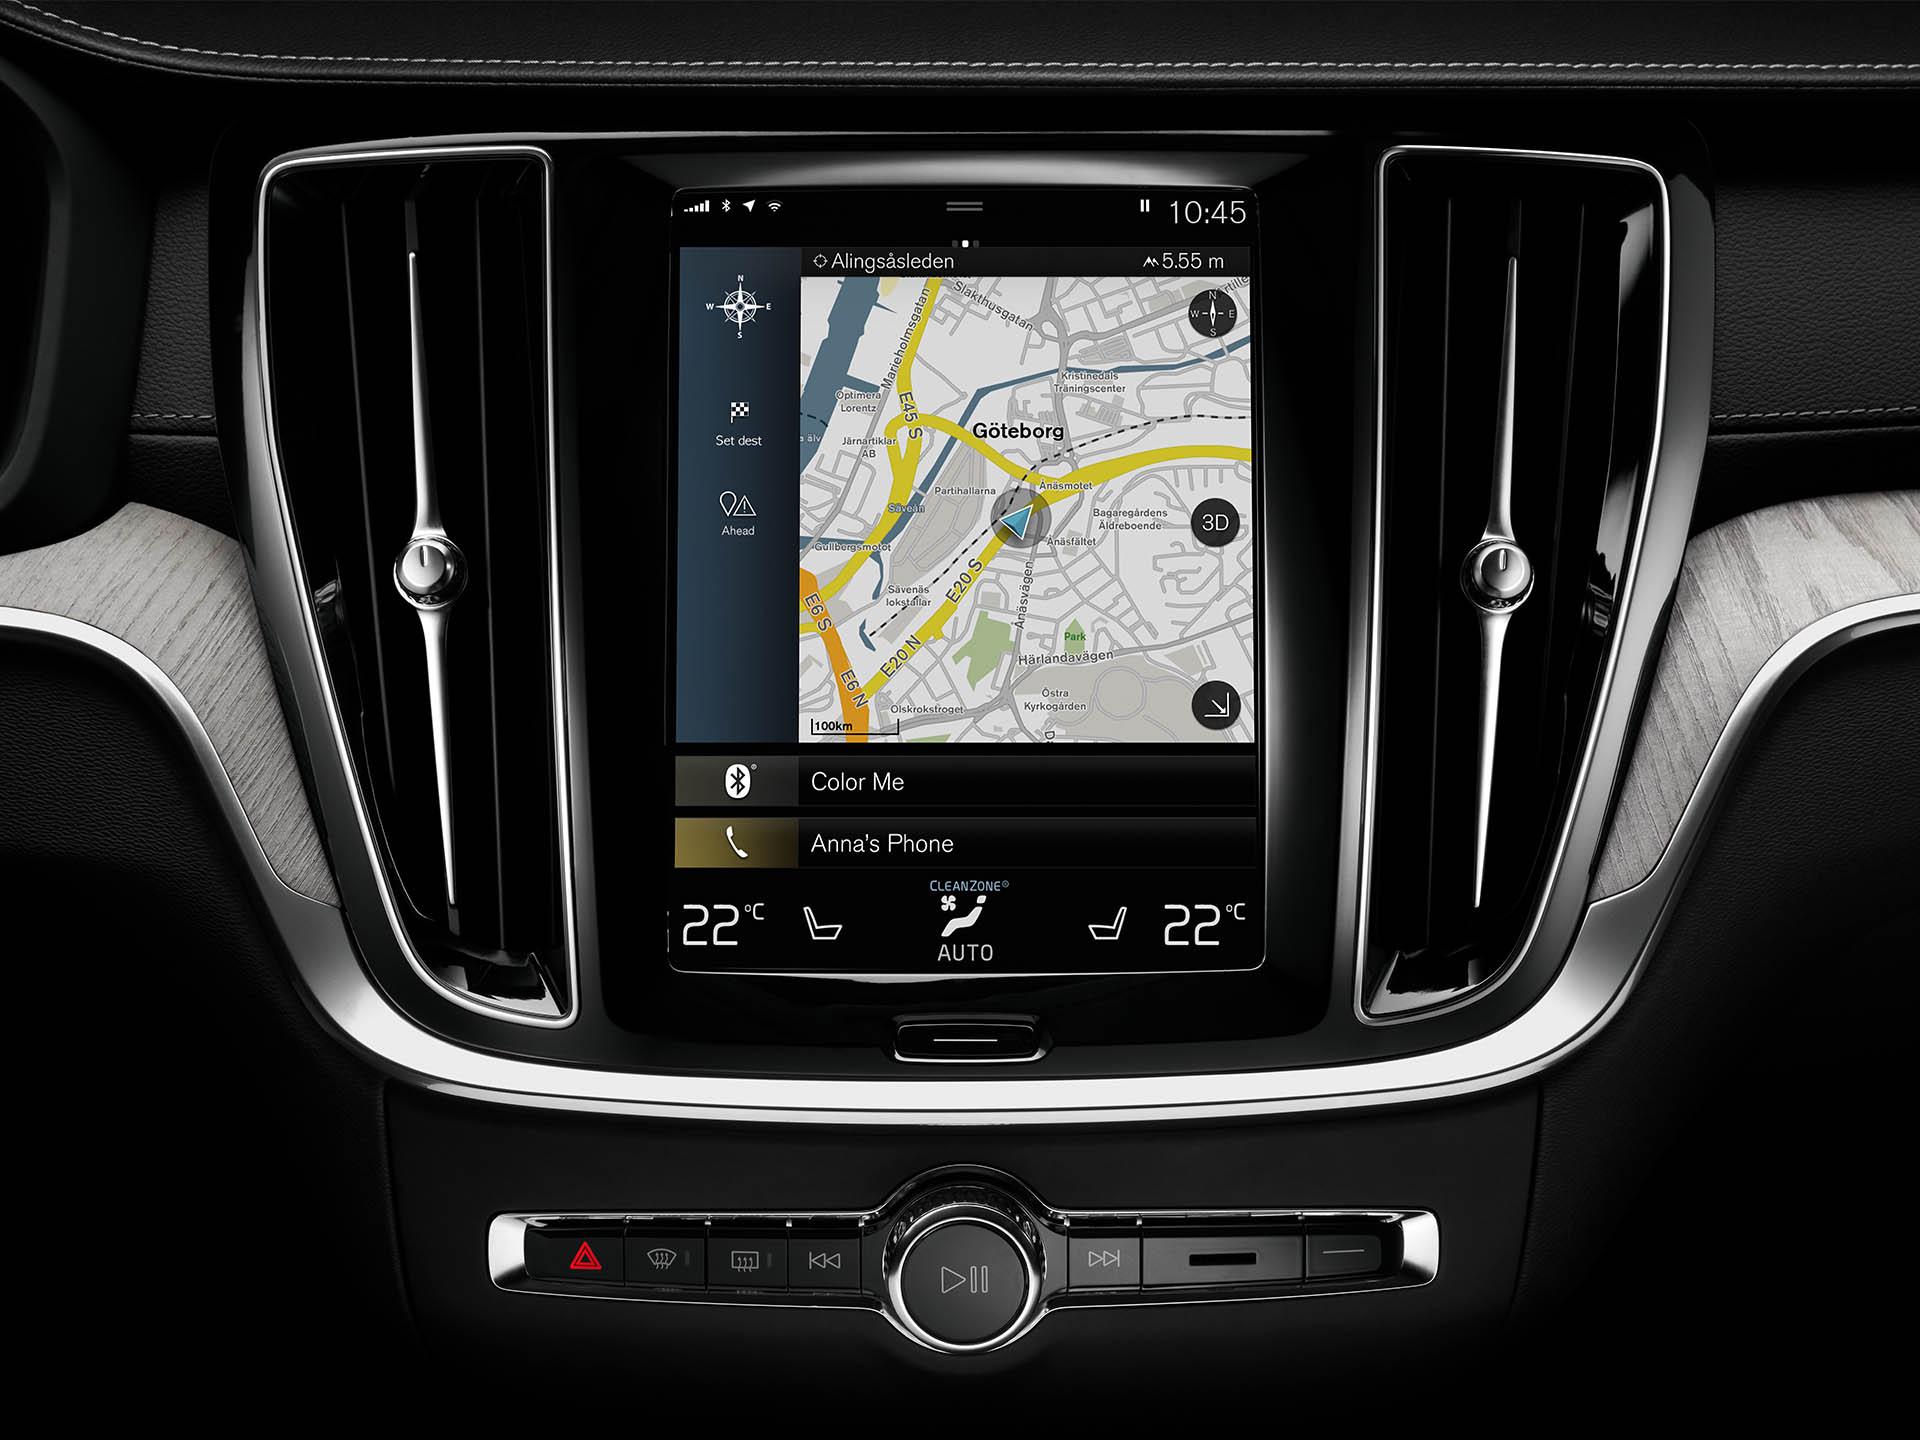 Volvo 내에 설치된 통합 연결 시스템은 Gothenburg 시내 지도가 디스플레이합니다